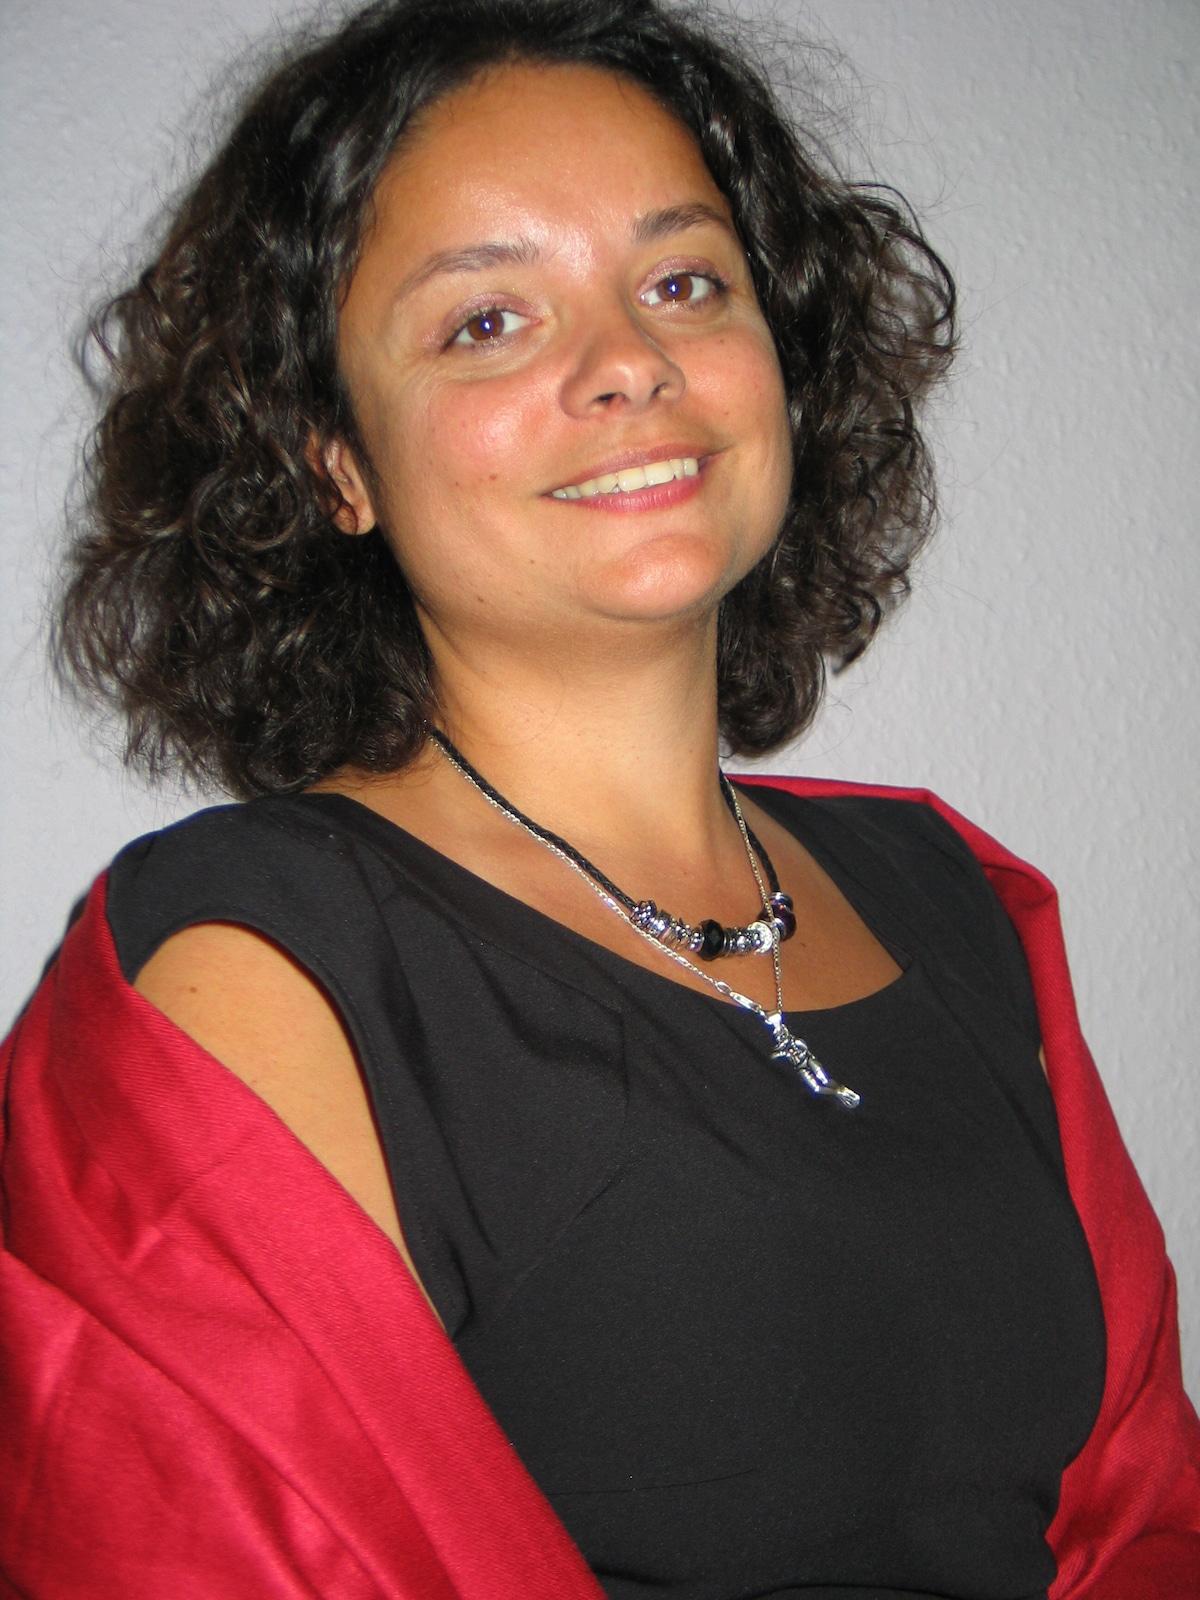 Ana from El Helal